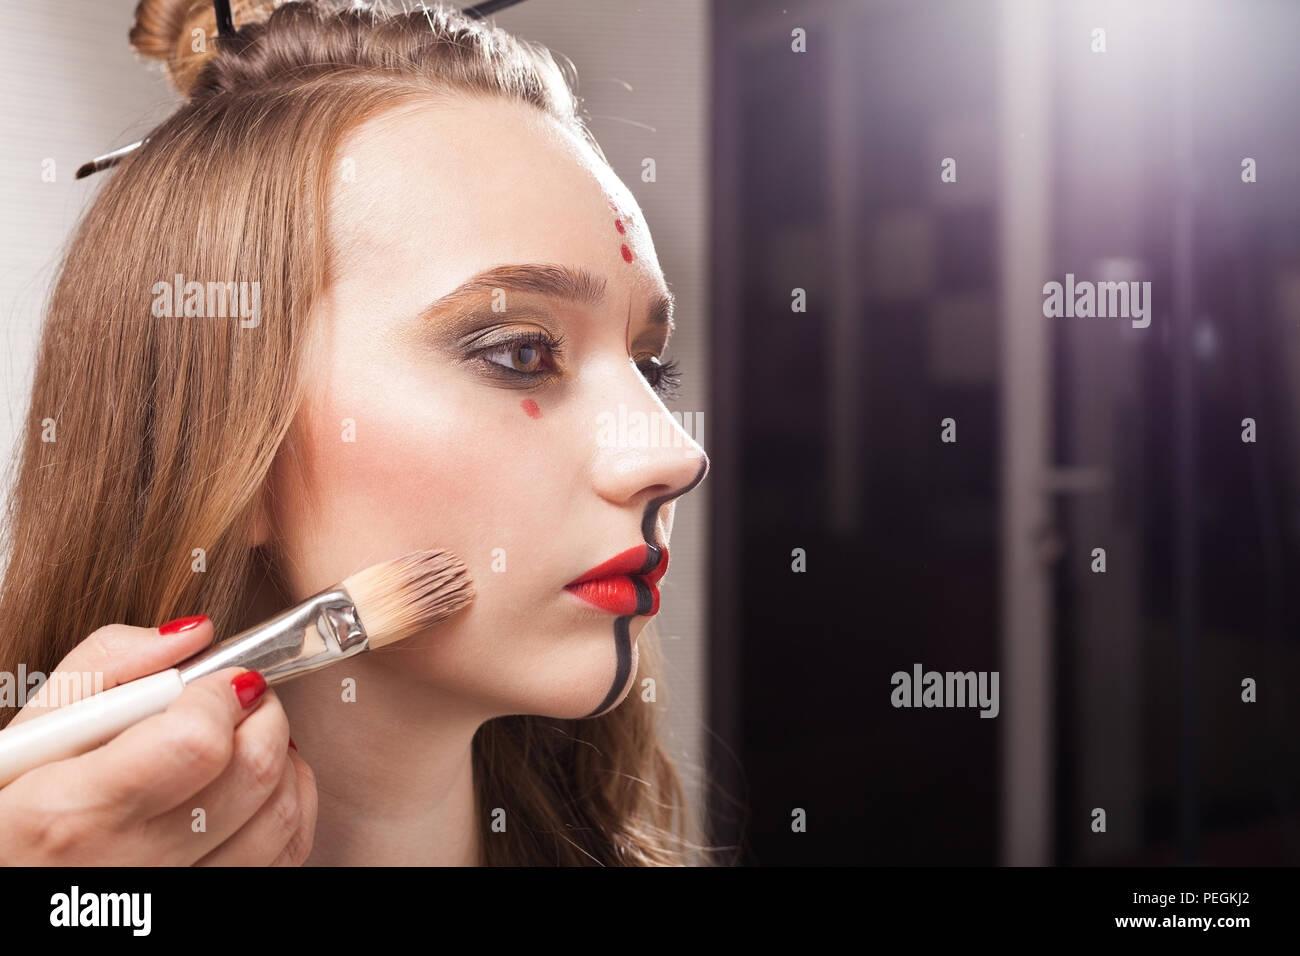 Make Up Woman Applying Foundation On A Model Stock Photo Alamy